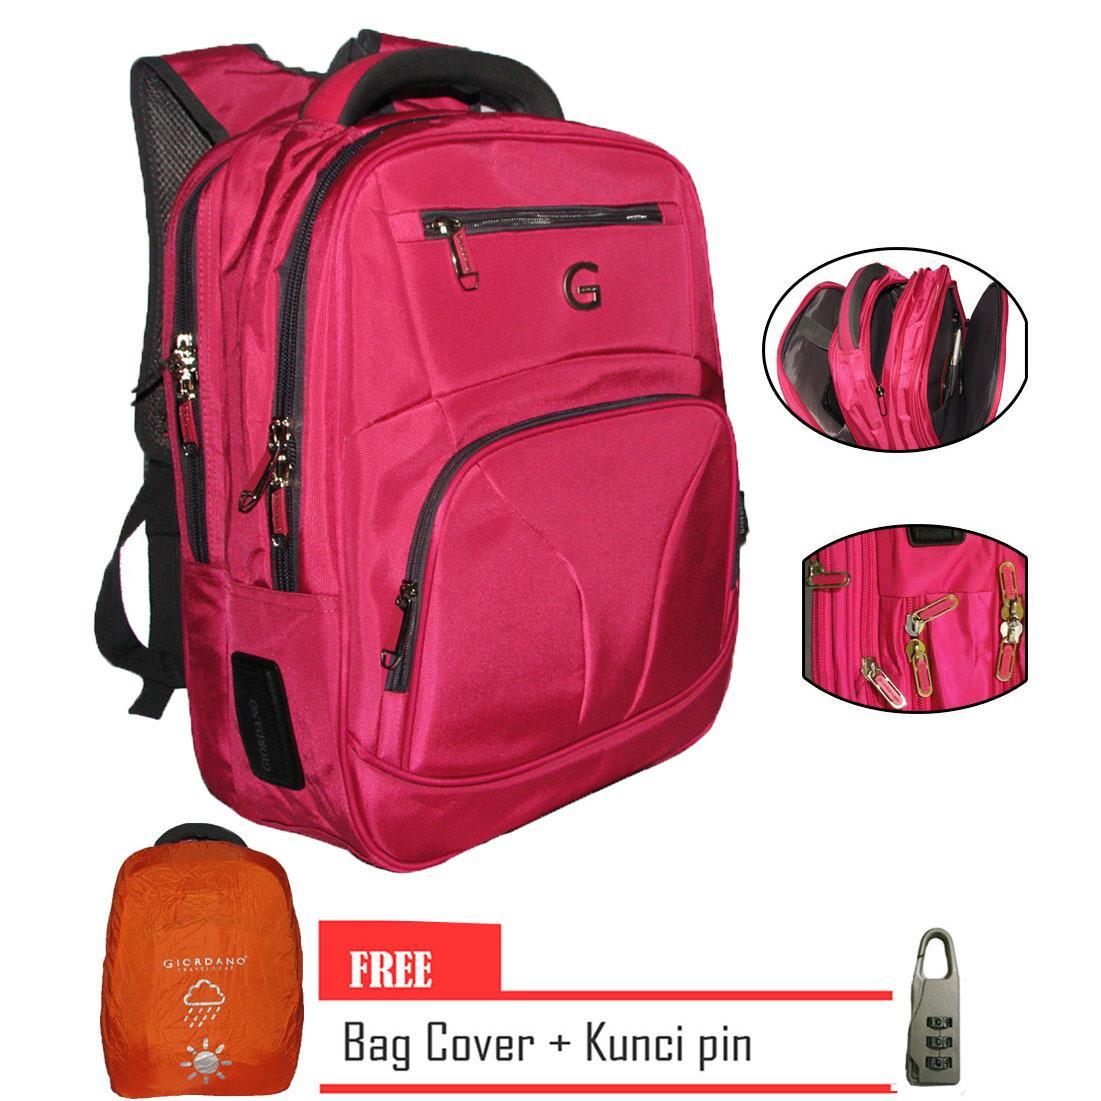 Giordano Backpack Laptop Original Import Free -PINK Dengan Kunci Pin